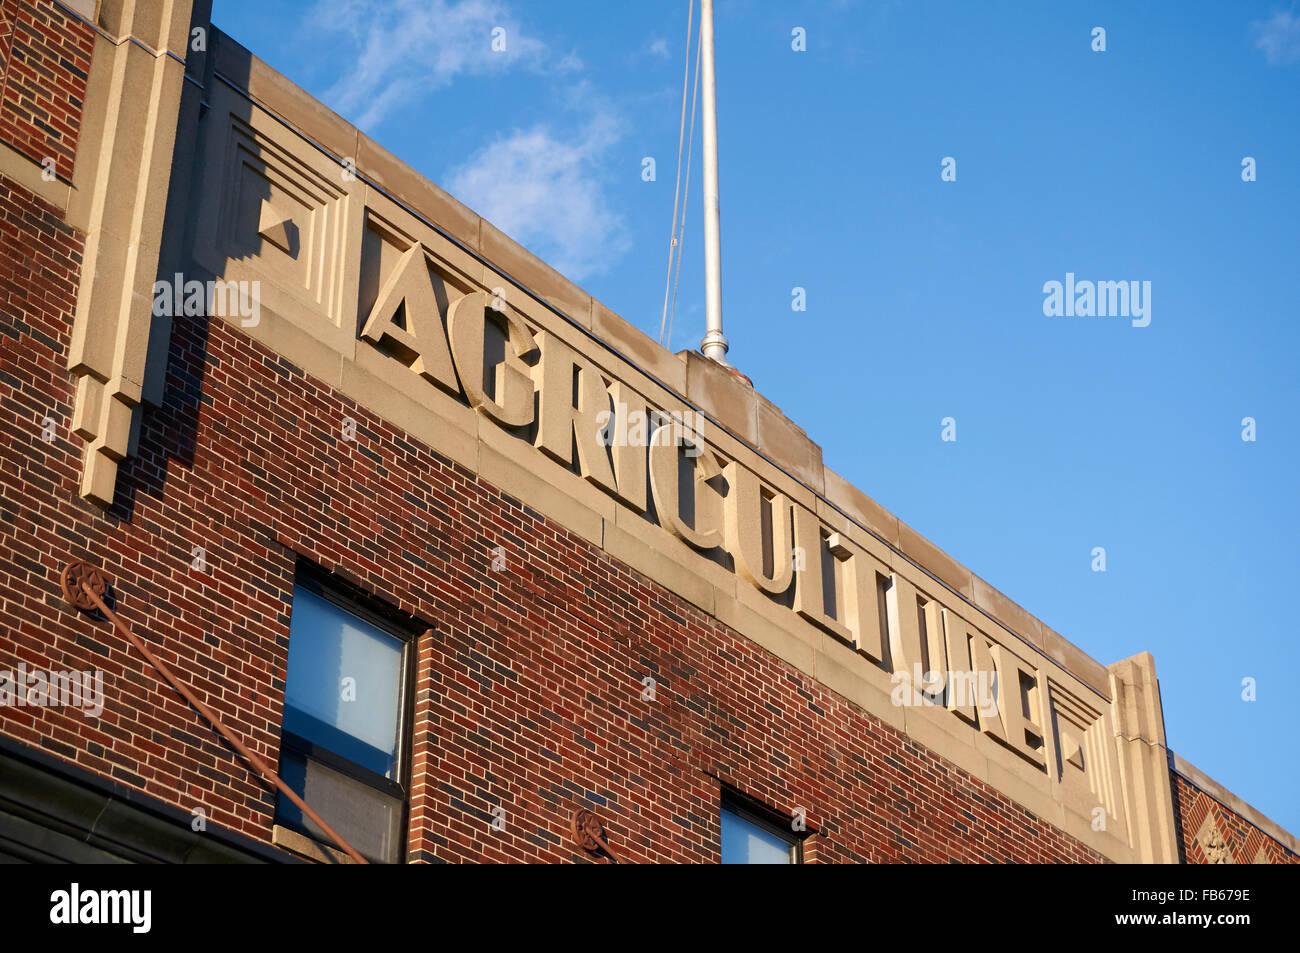 Fassade Zeigen Stockfotos & Fassade Zeigen Bilder - Alamy